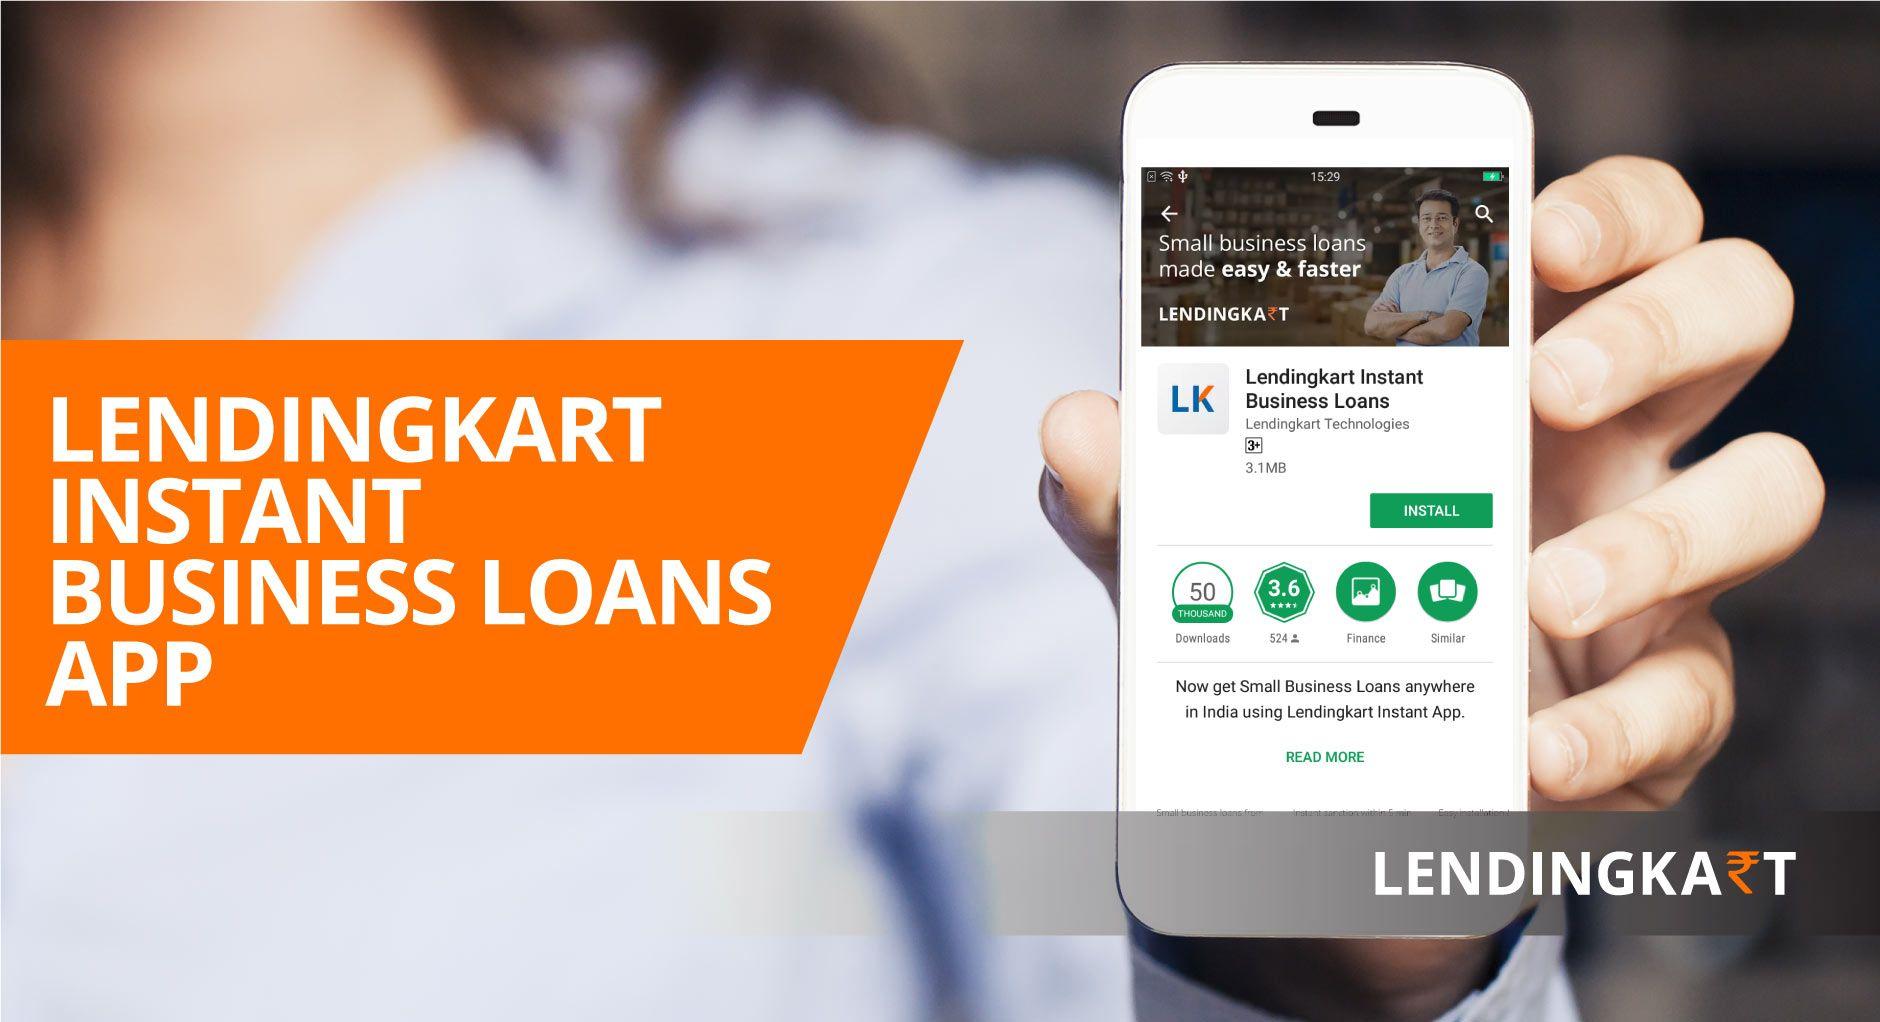 Lendingkart Finance Mobile A First Of Its Kind Mobile Application